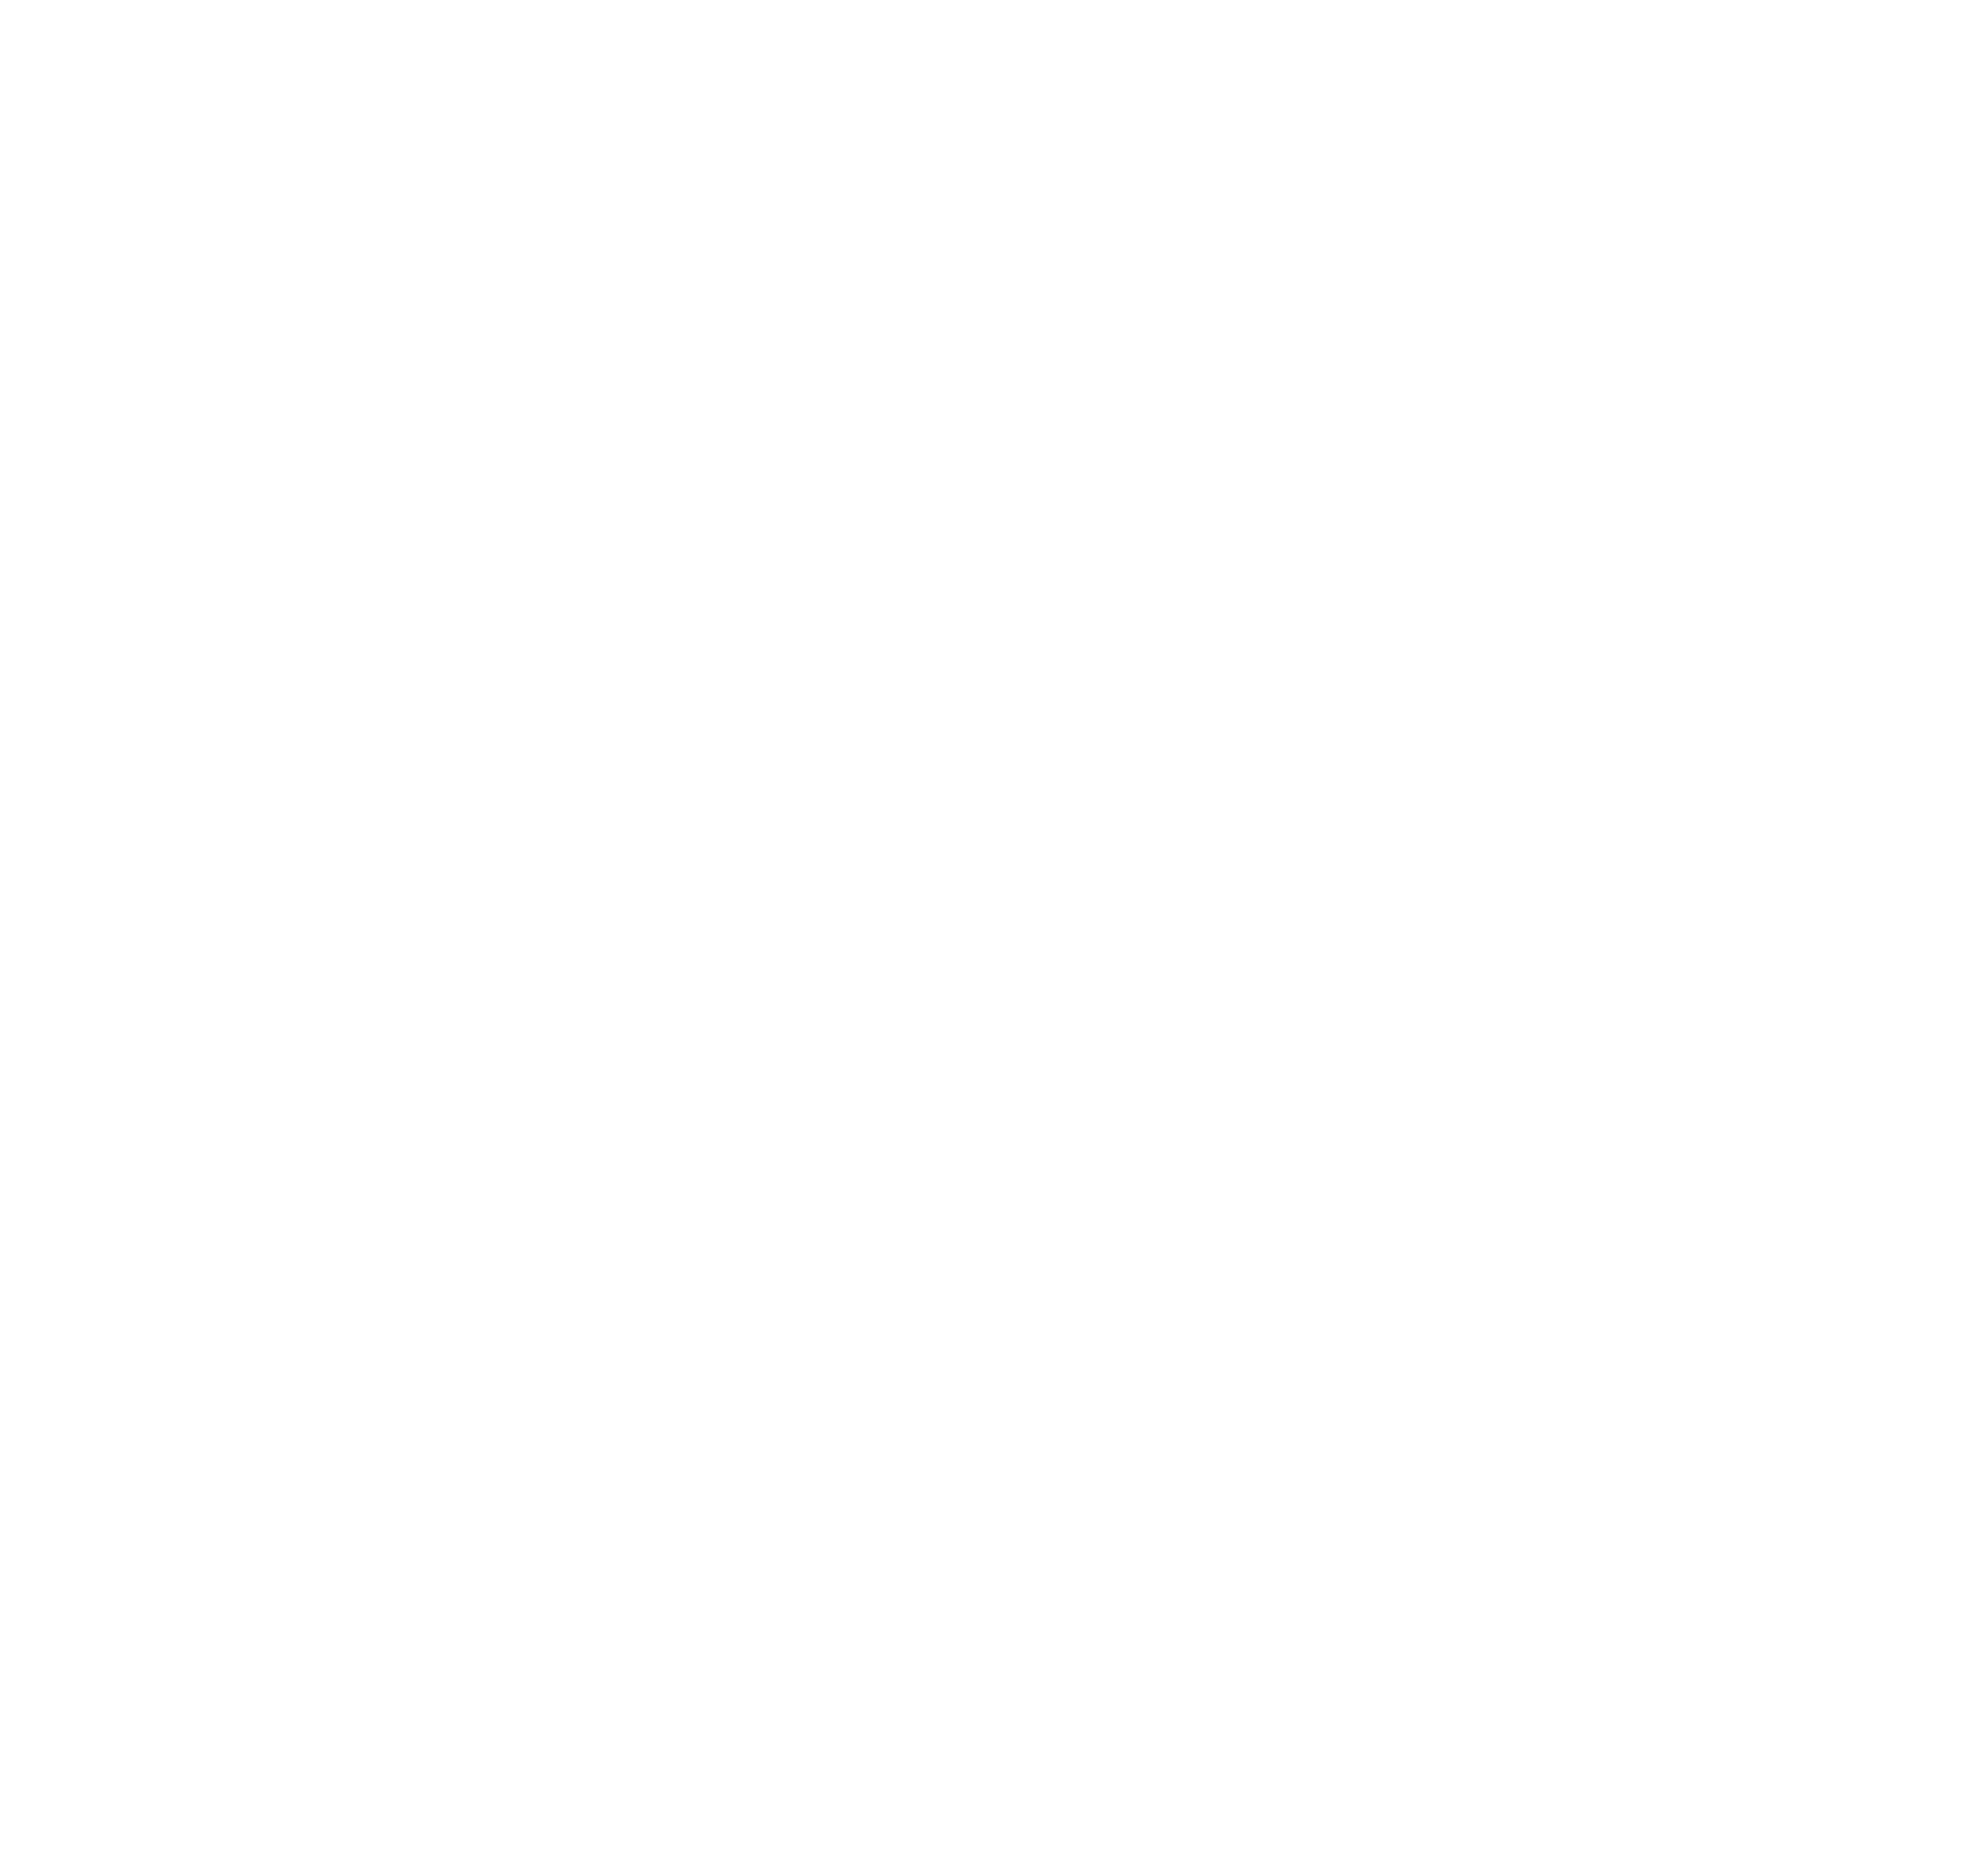 Gank-Zone